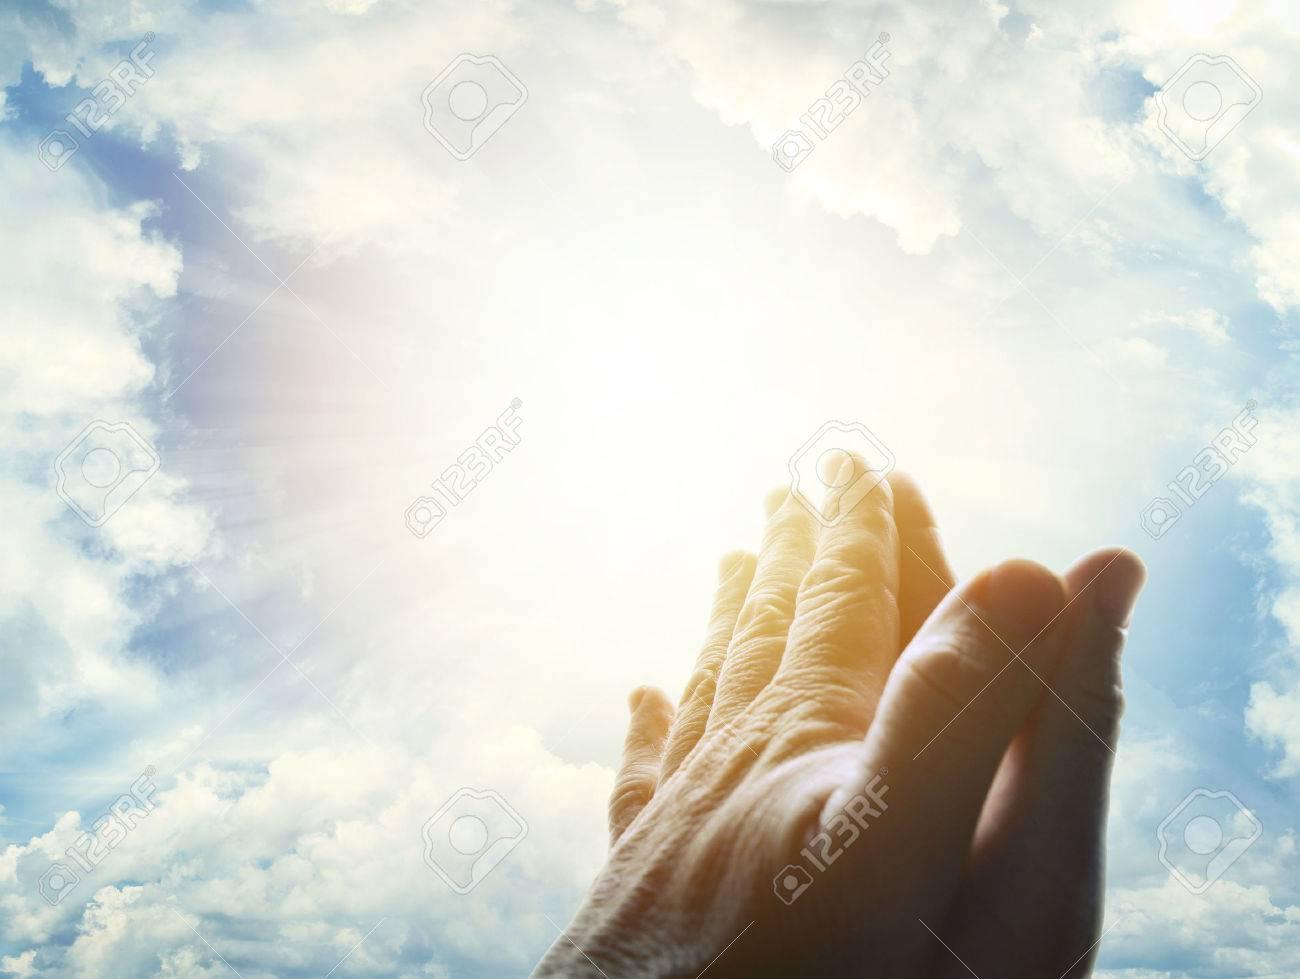 praying hands stock photos royalty free praying hands images